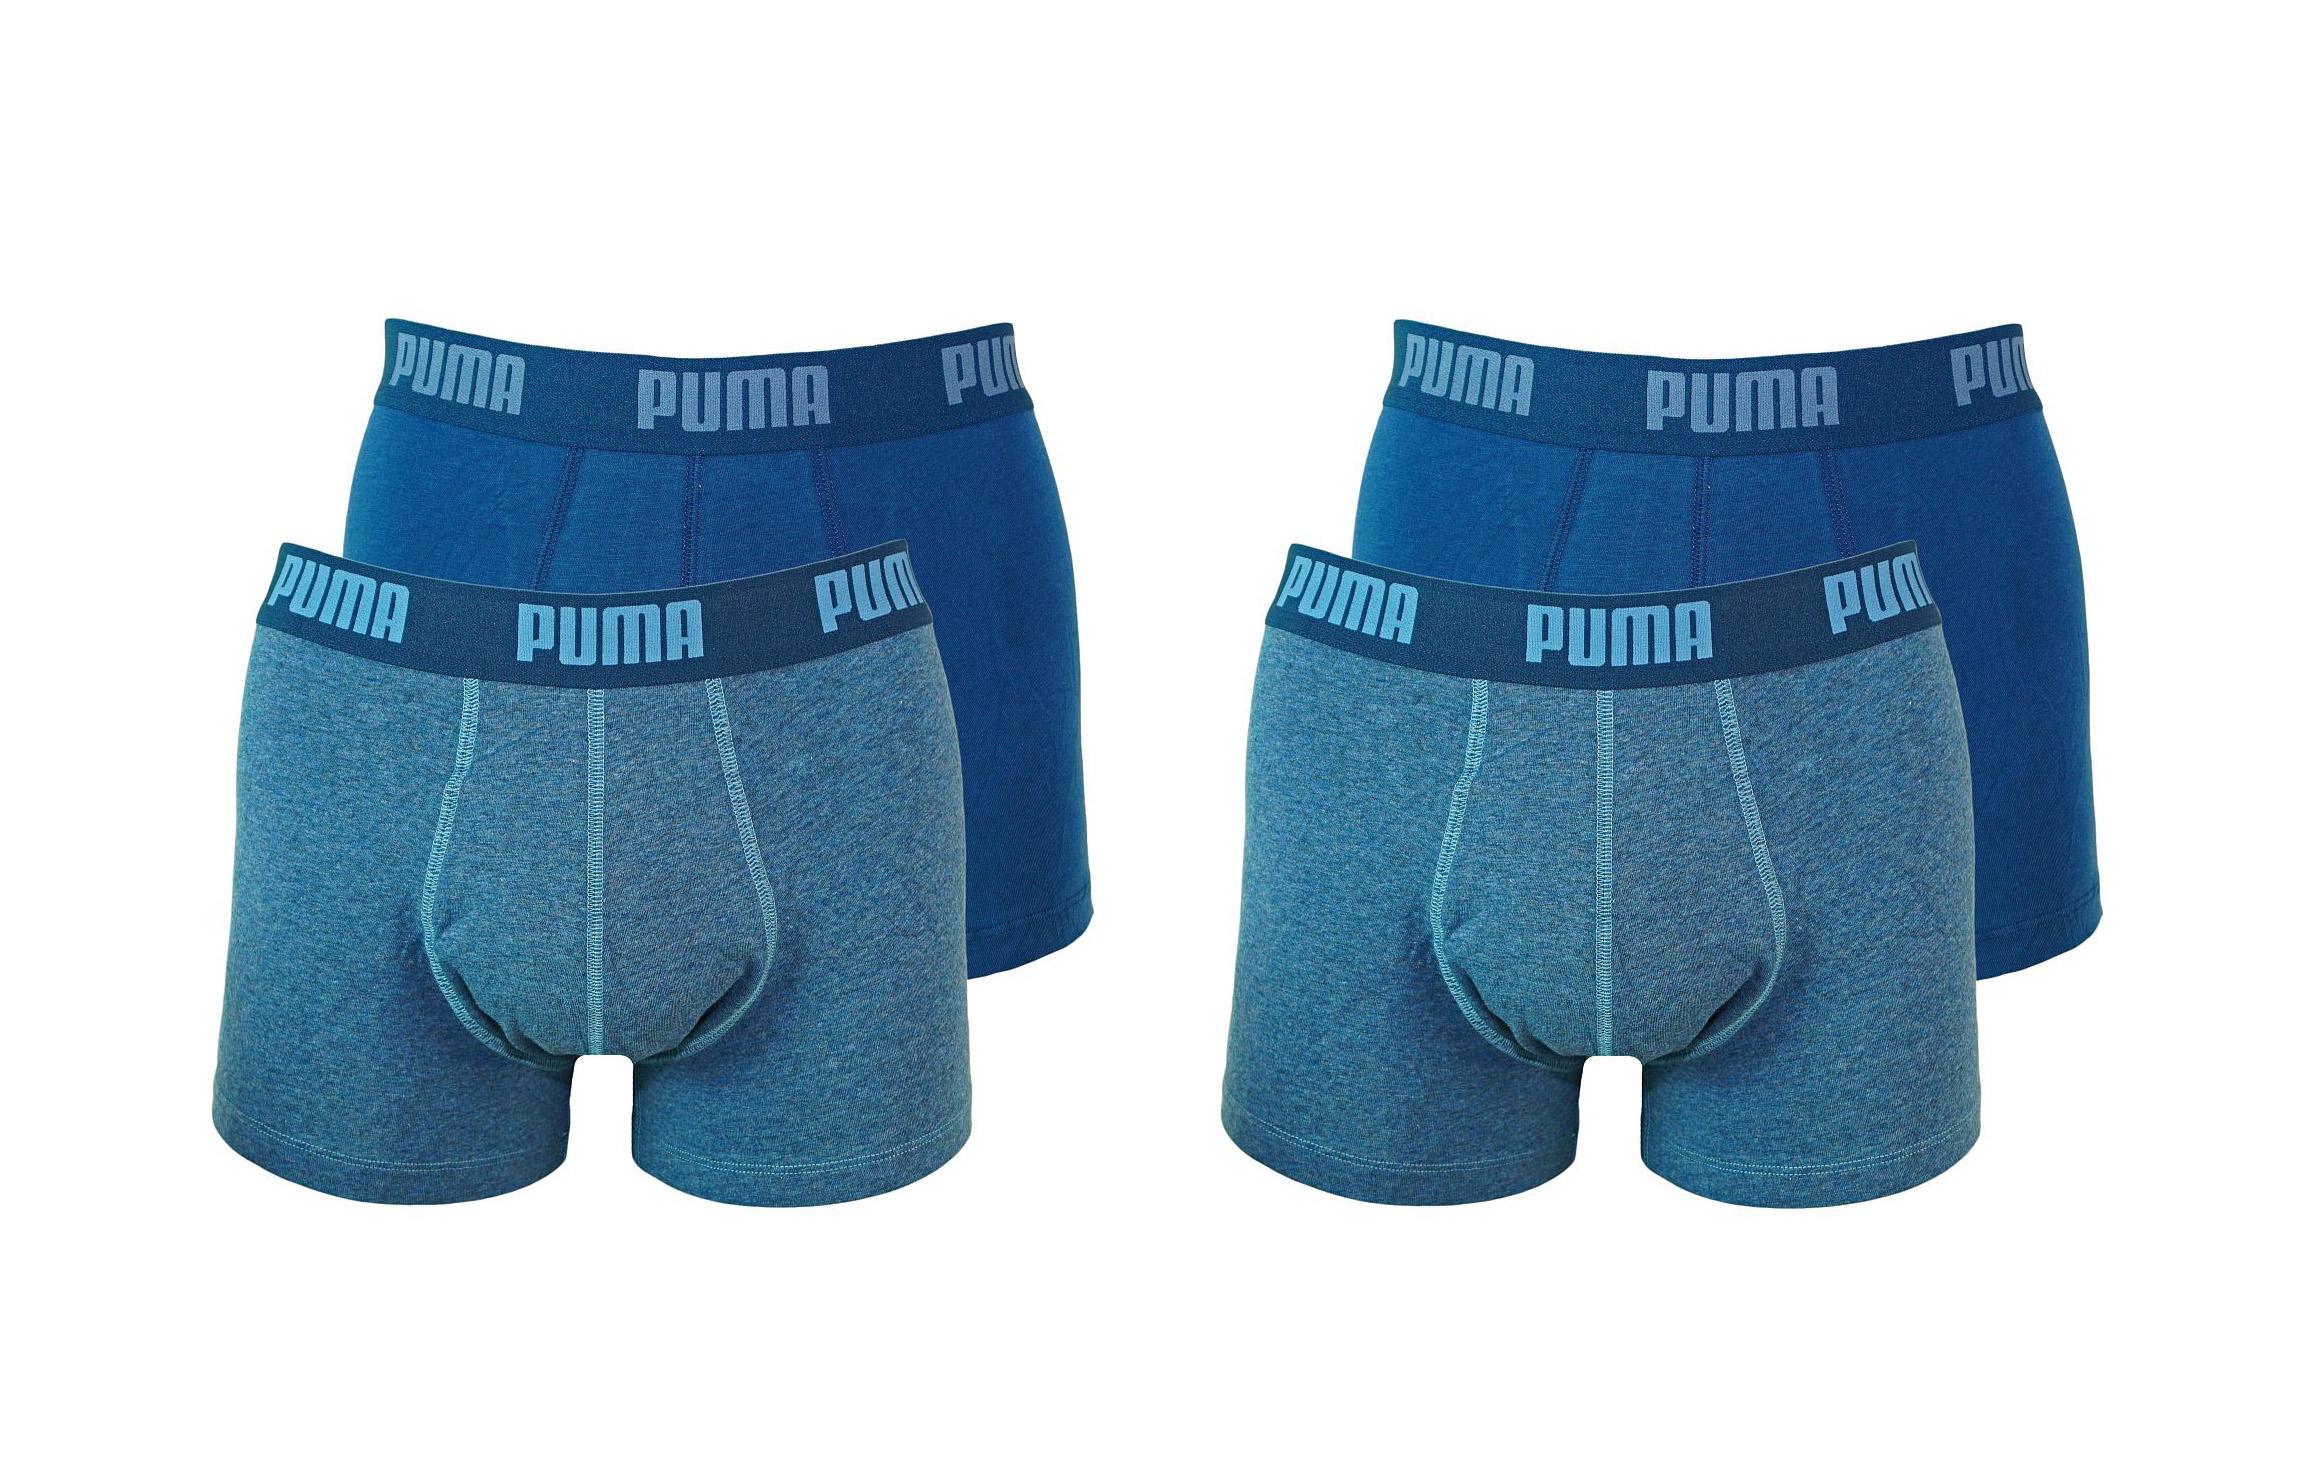 PUMA Shorts Unterhosen 2 x 2er Pack Trunk 521025001 162 020 denim SF17-PMS2